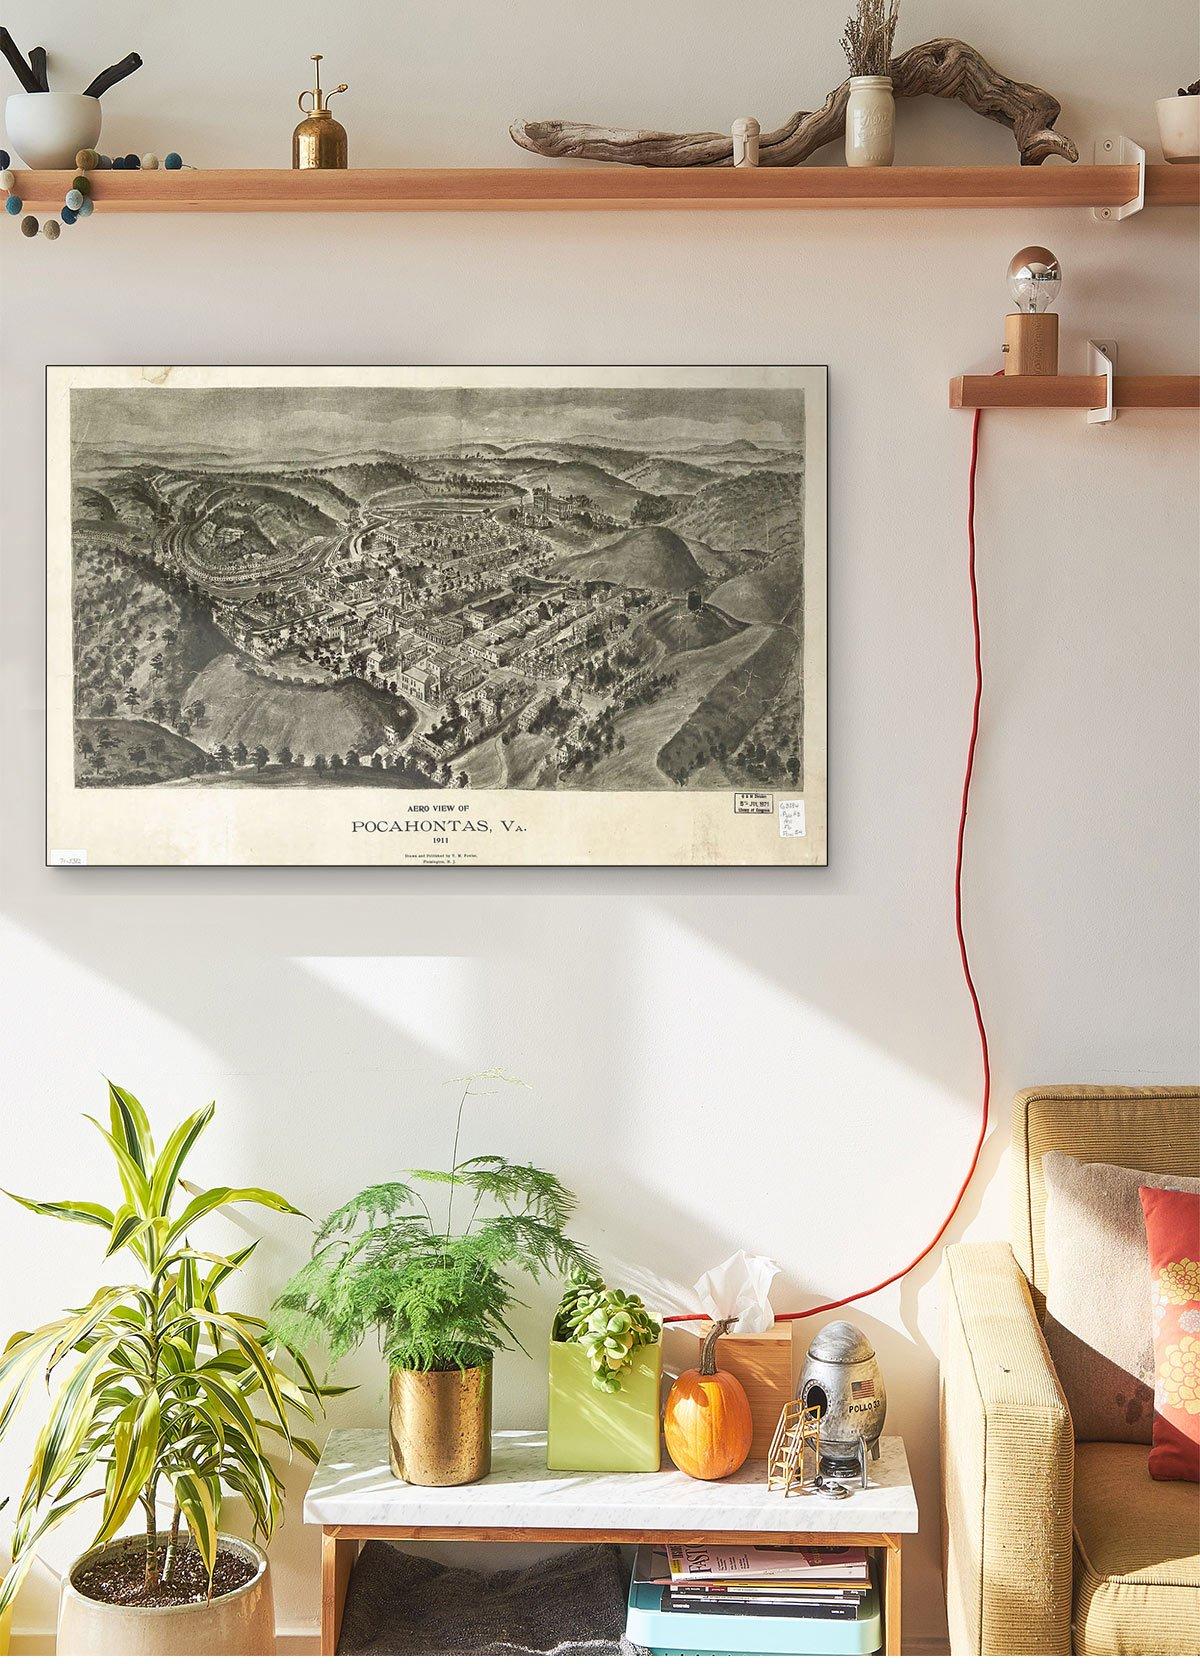 Aero View Of Pocahontas Va 1911 LARGE Vintage Map